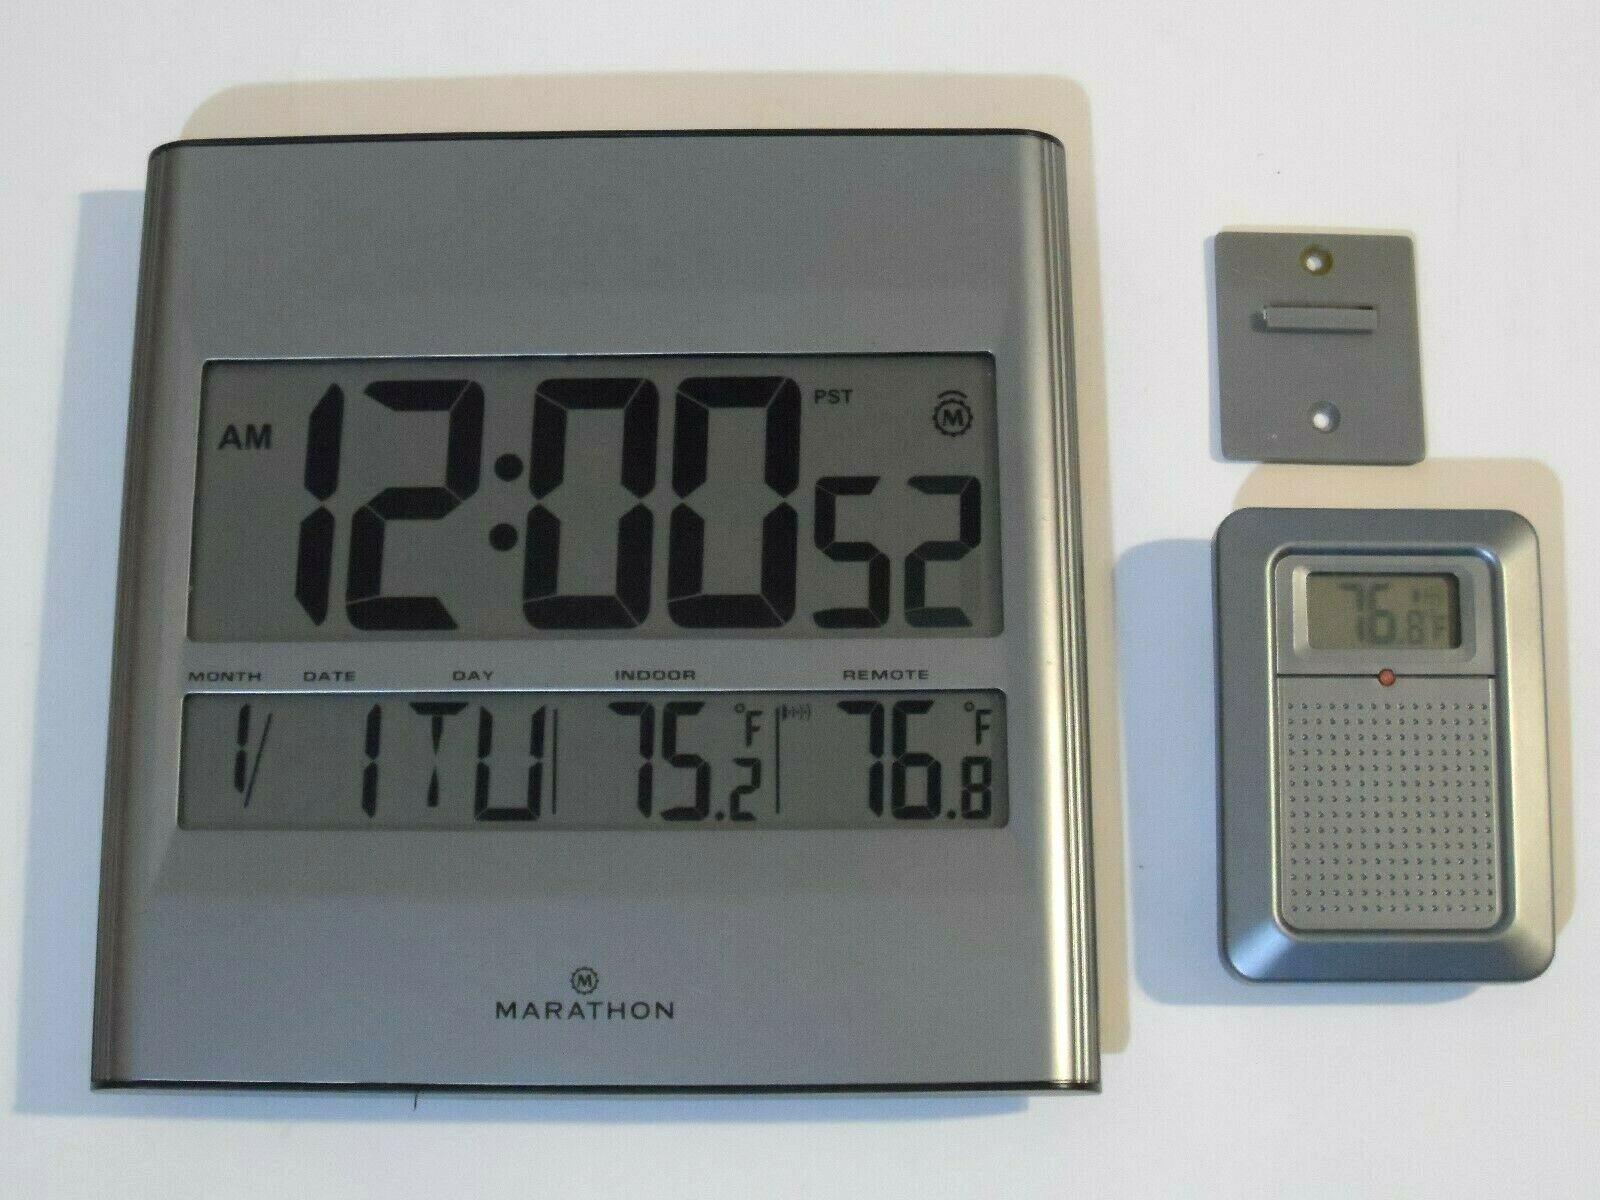 1fb01fcafd52b5e7d0b985cabaca2c2a - Better Homes & Gardens Digital Atomic Clock